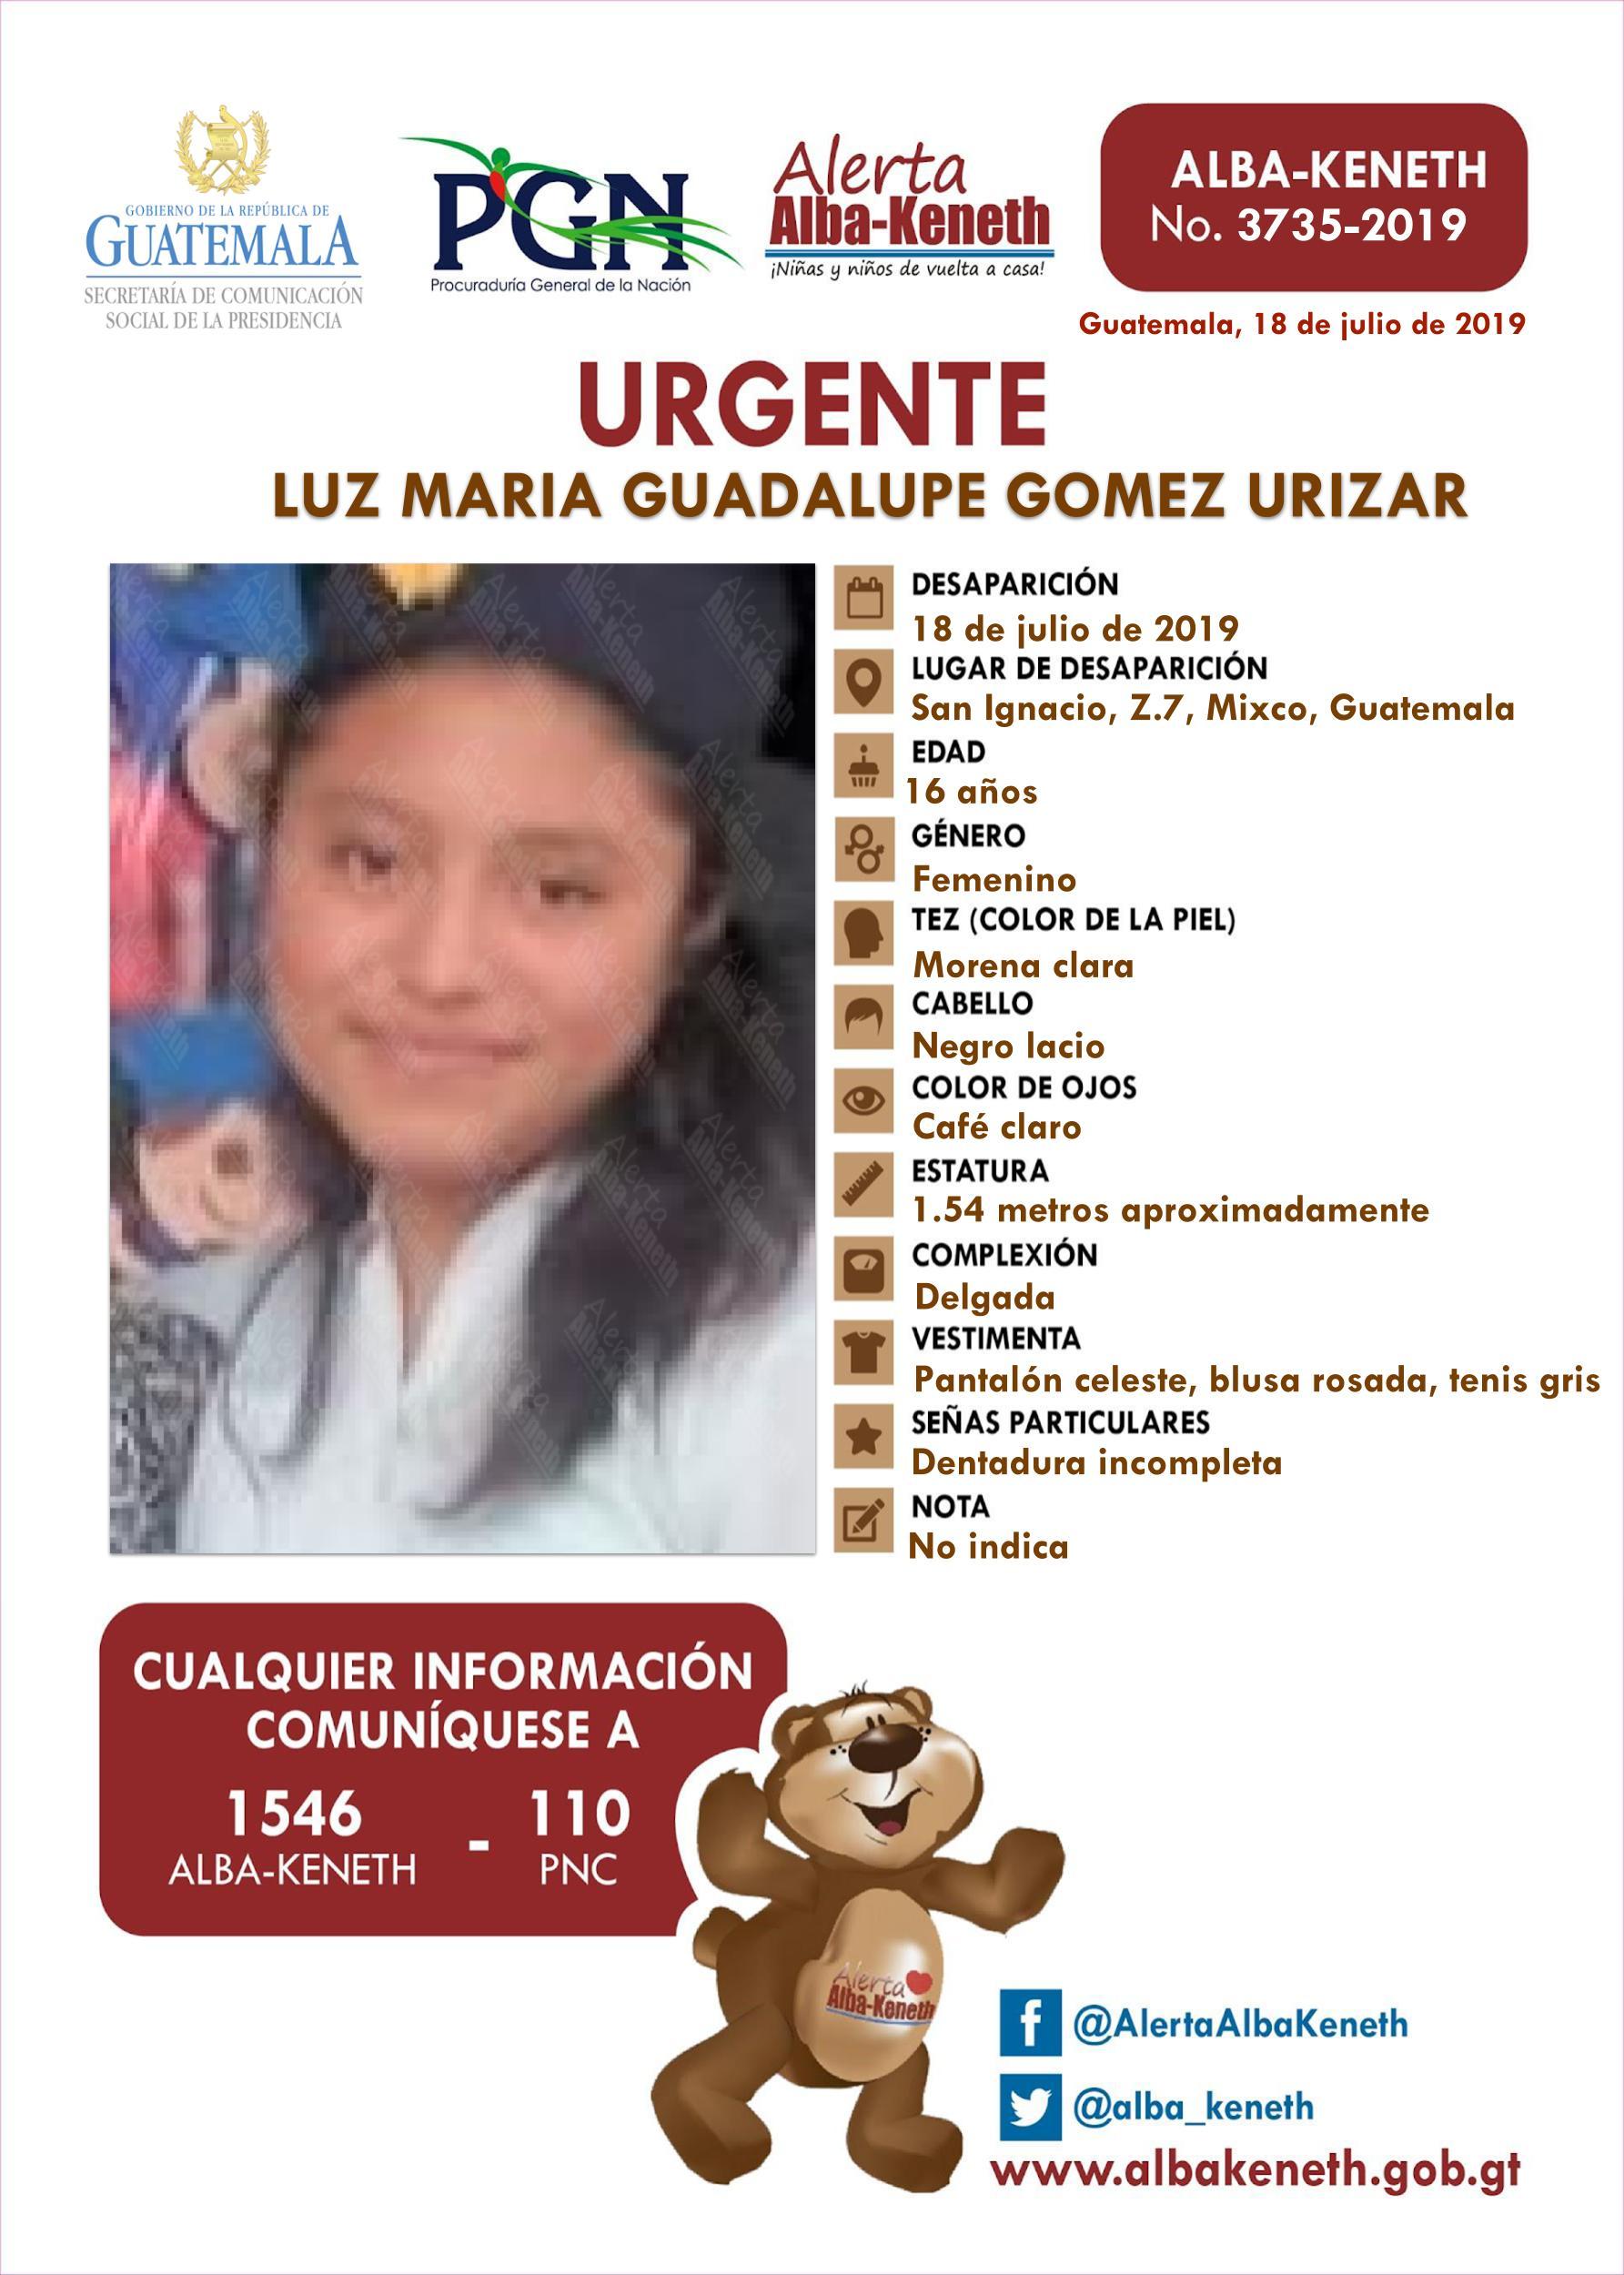 Luz Maria Guadalupe Gomez Urizar